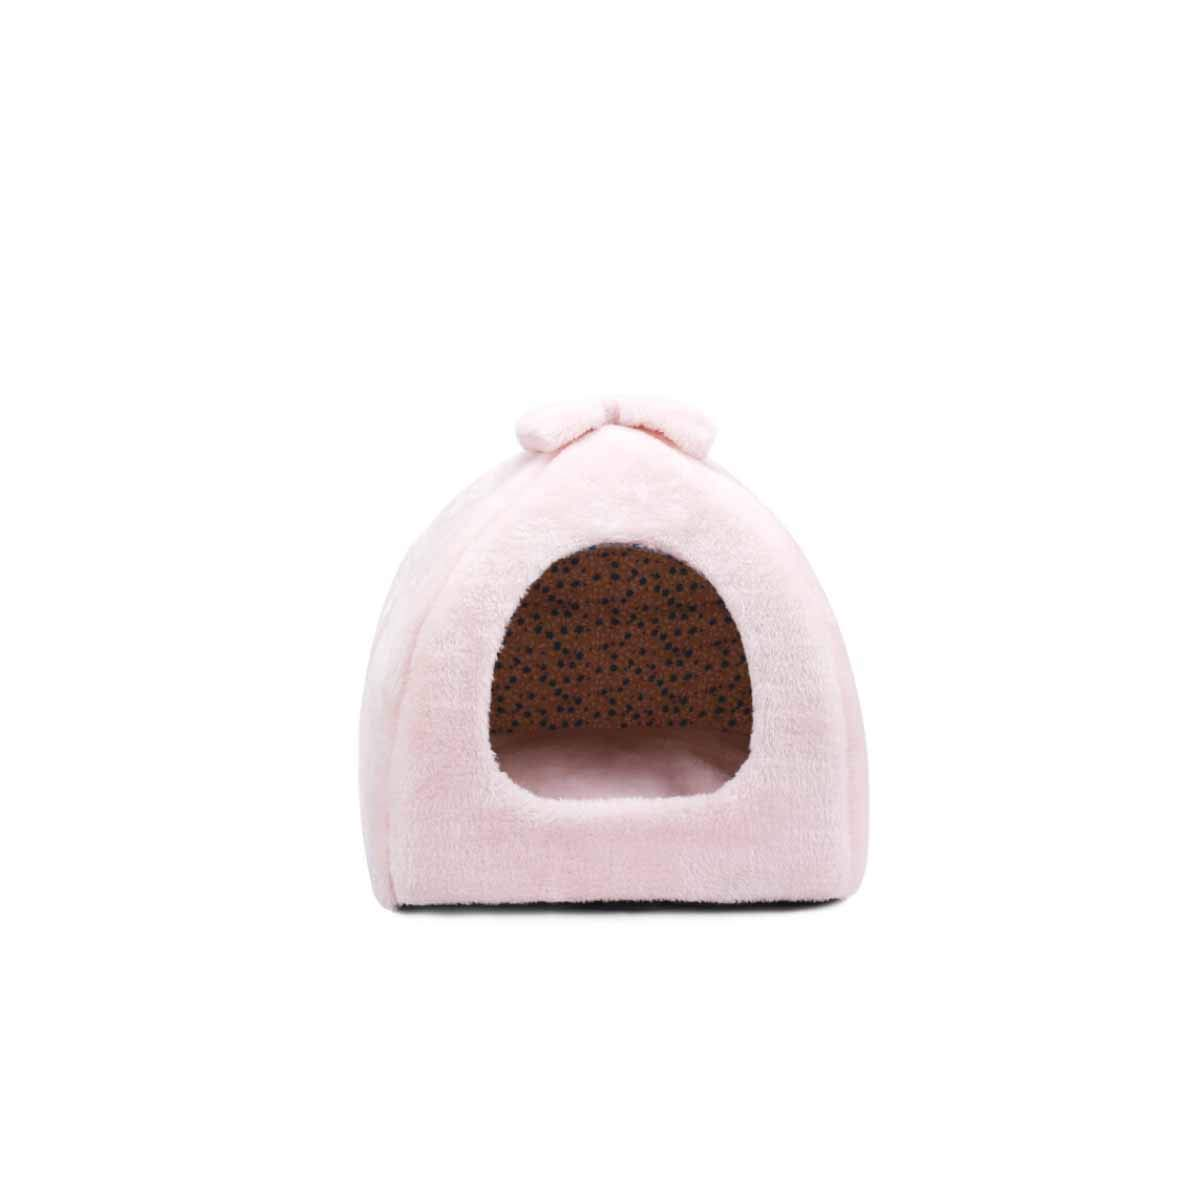 bluee S bluee S Muziwenju Kennel, cat Kennel, winter closed pet mat, Teddy warm nest, medium dog, dog kennel, rabbit nest, (color   bluee, Size   S)